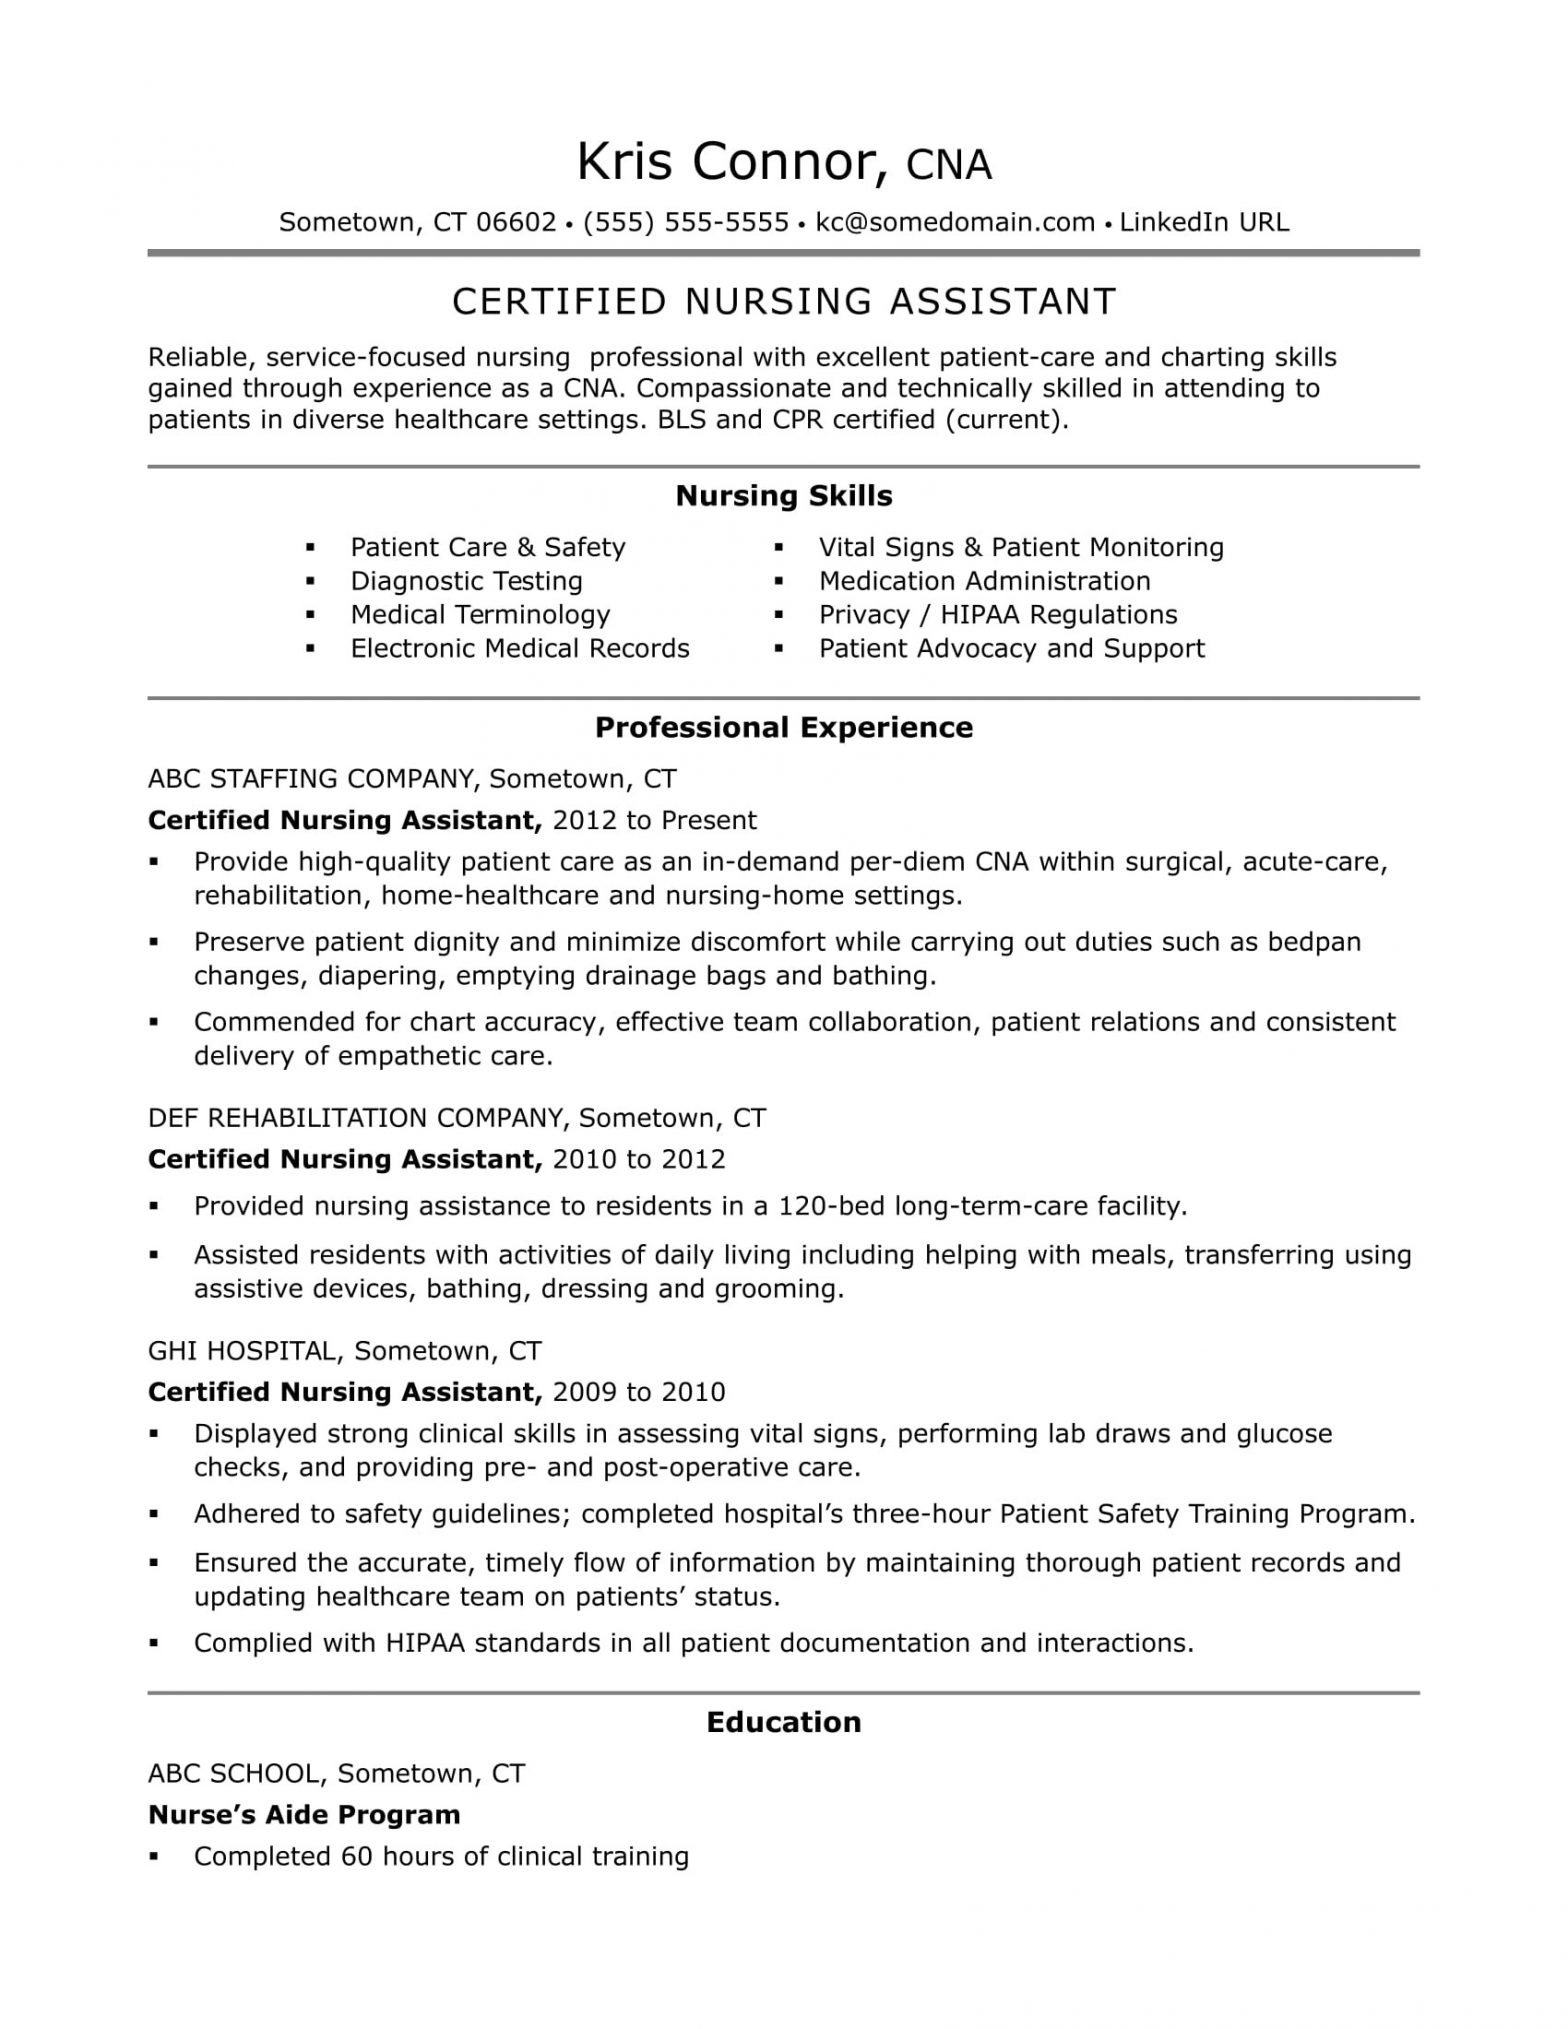 Sample Resume for Cna with Previous Experience Cna Resume Examples: Skills for Cnas Monster.com